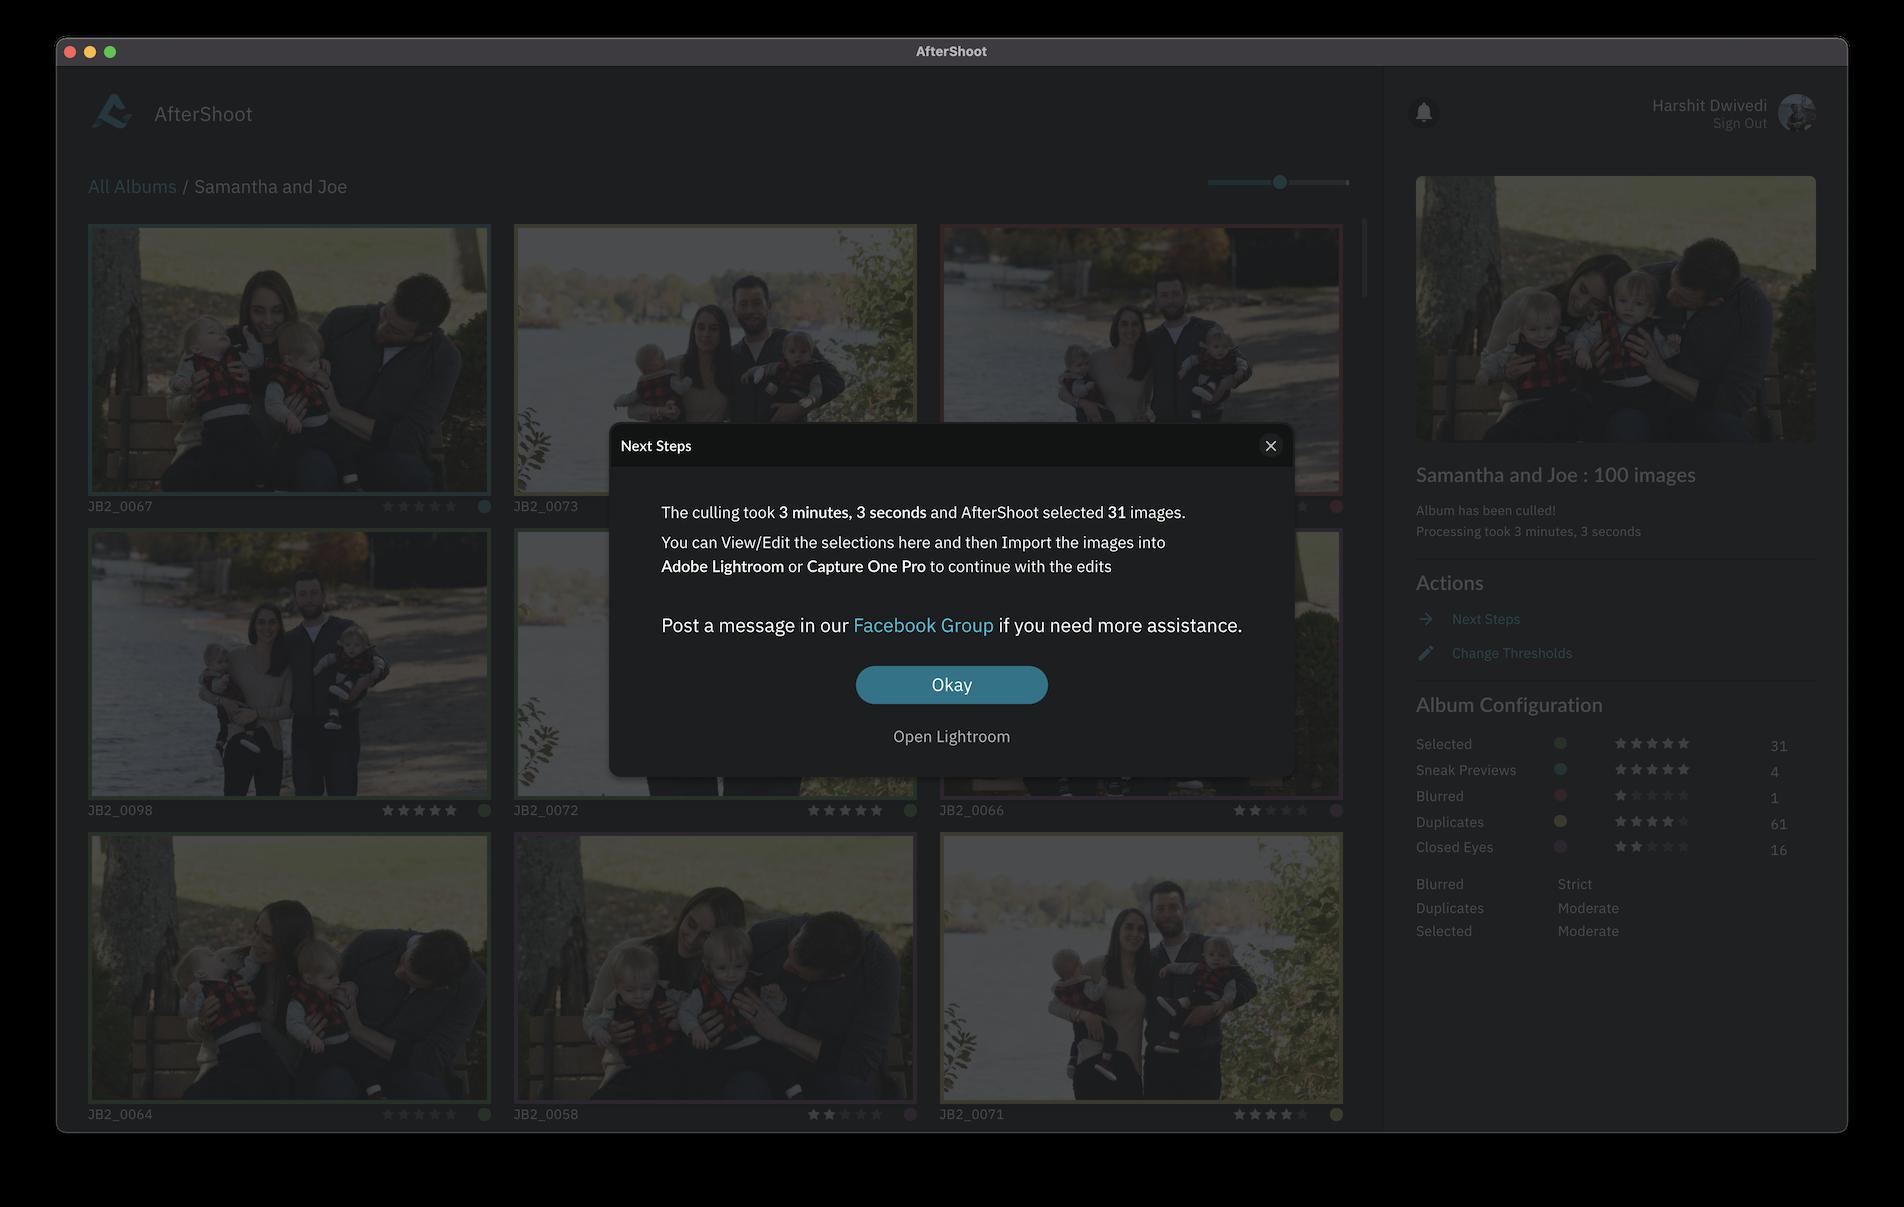 Screenshot of AfterShoot screen